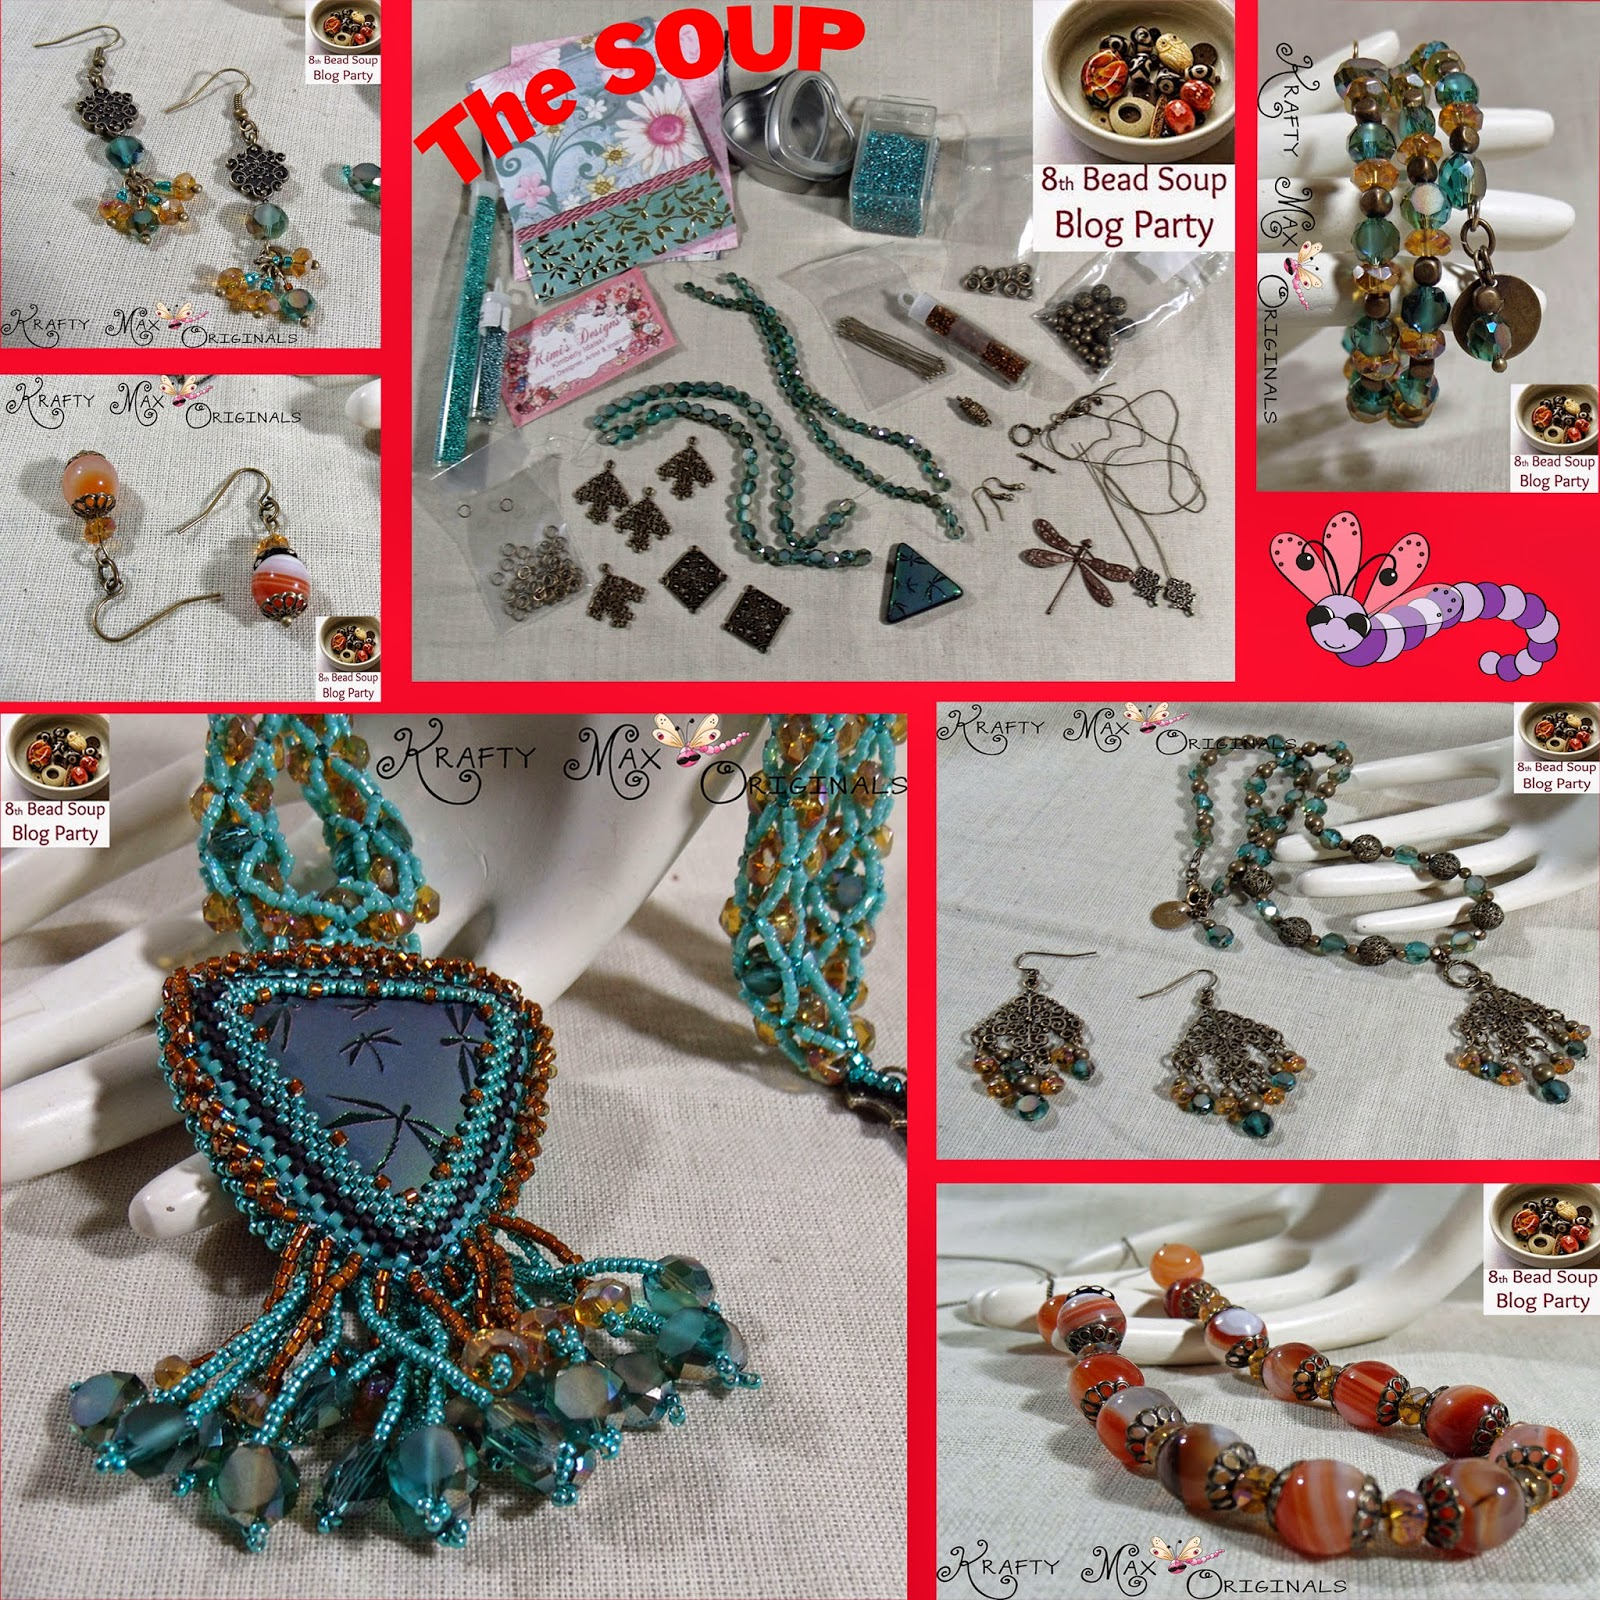 http://kraftymax.blogspot.com/2014/05/8th-bead-soup-blog-party-big-reveal.html